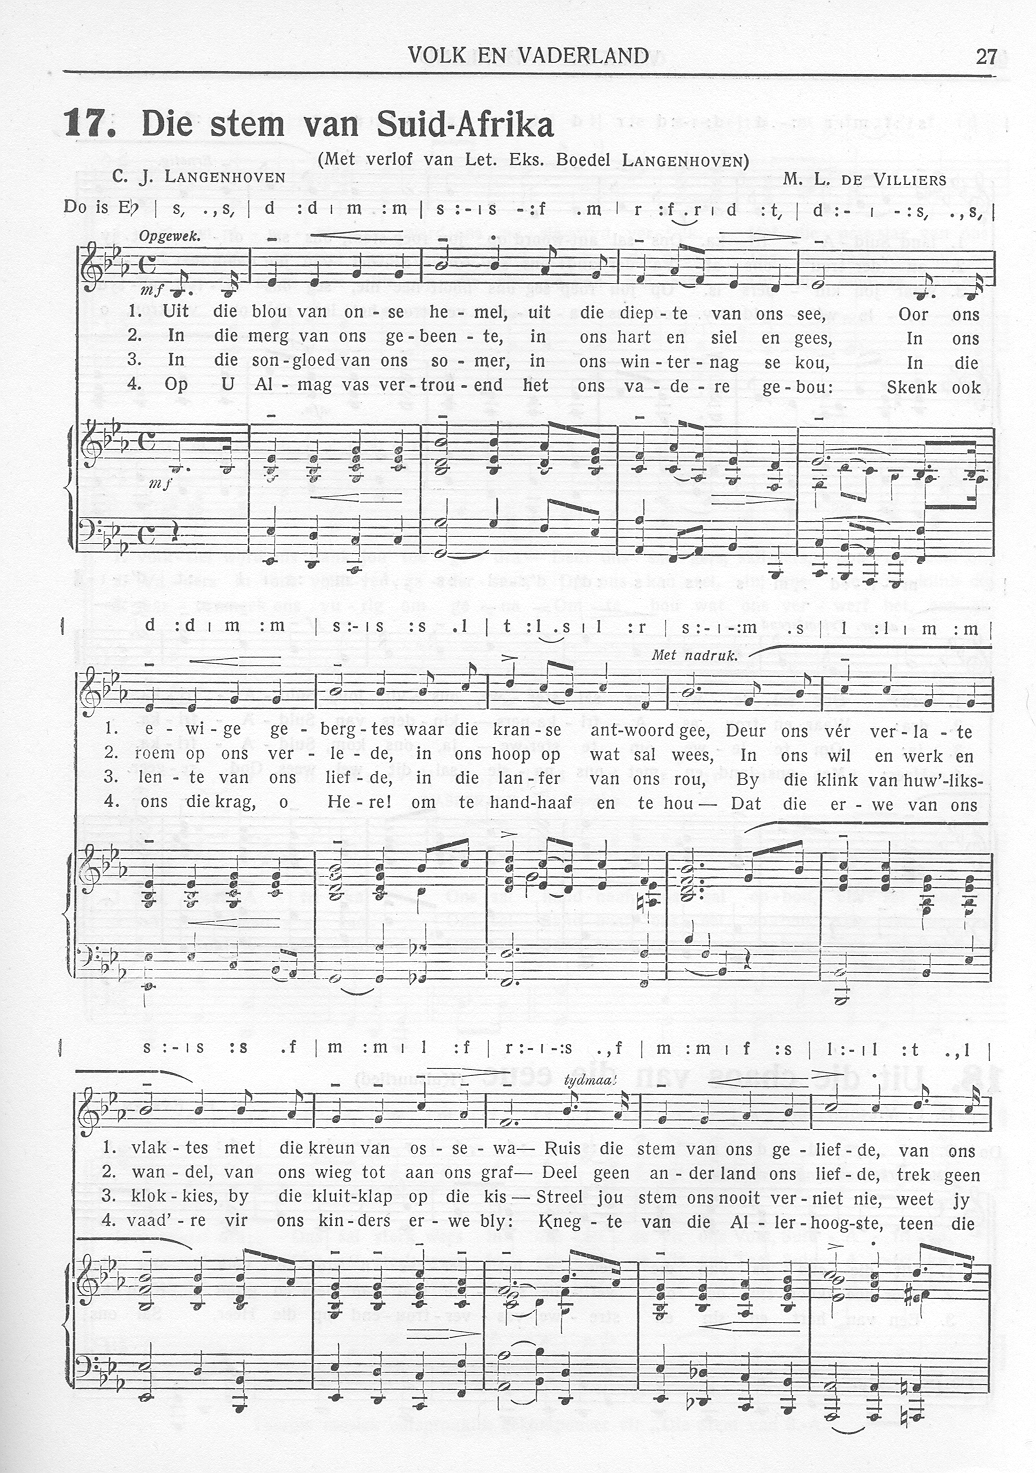 image about Black National Anthem Lyrics Printable named Die Stem van Suid-Afrika - Wikipedia